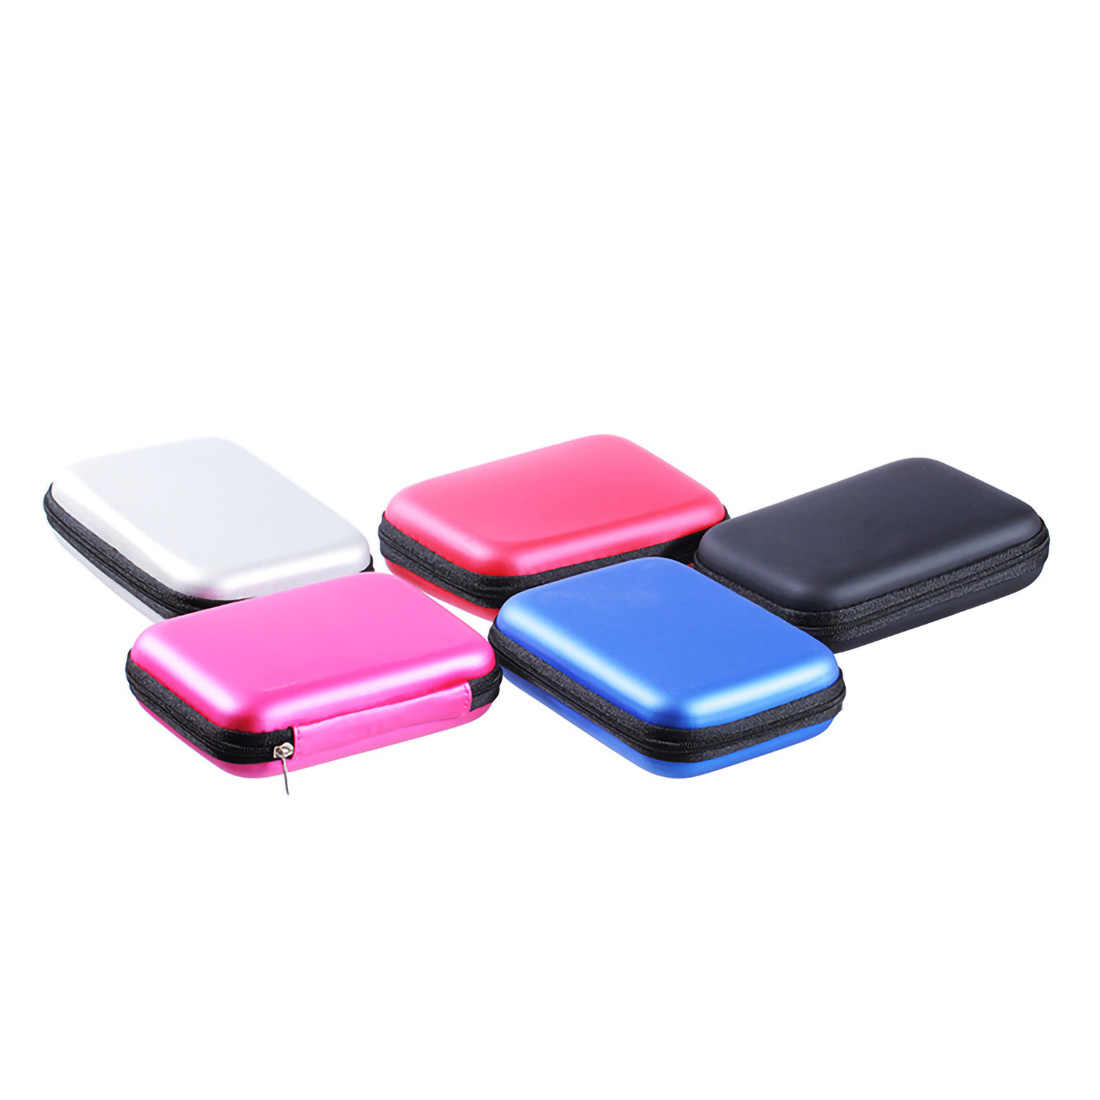 2,5 pulgadas disco duro externo funda protectora HDD SSD bolsa Portátil Bolsa USB Cable banco de alimentación organizador caja de almacenamiento